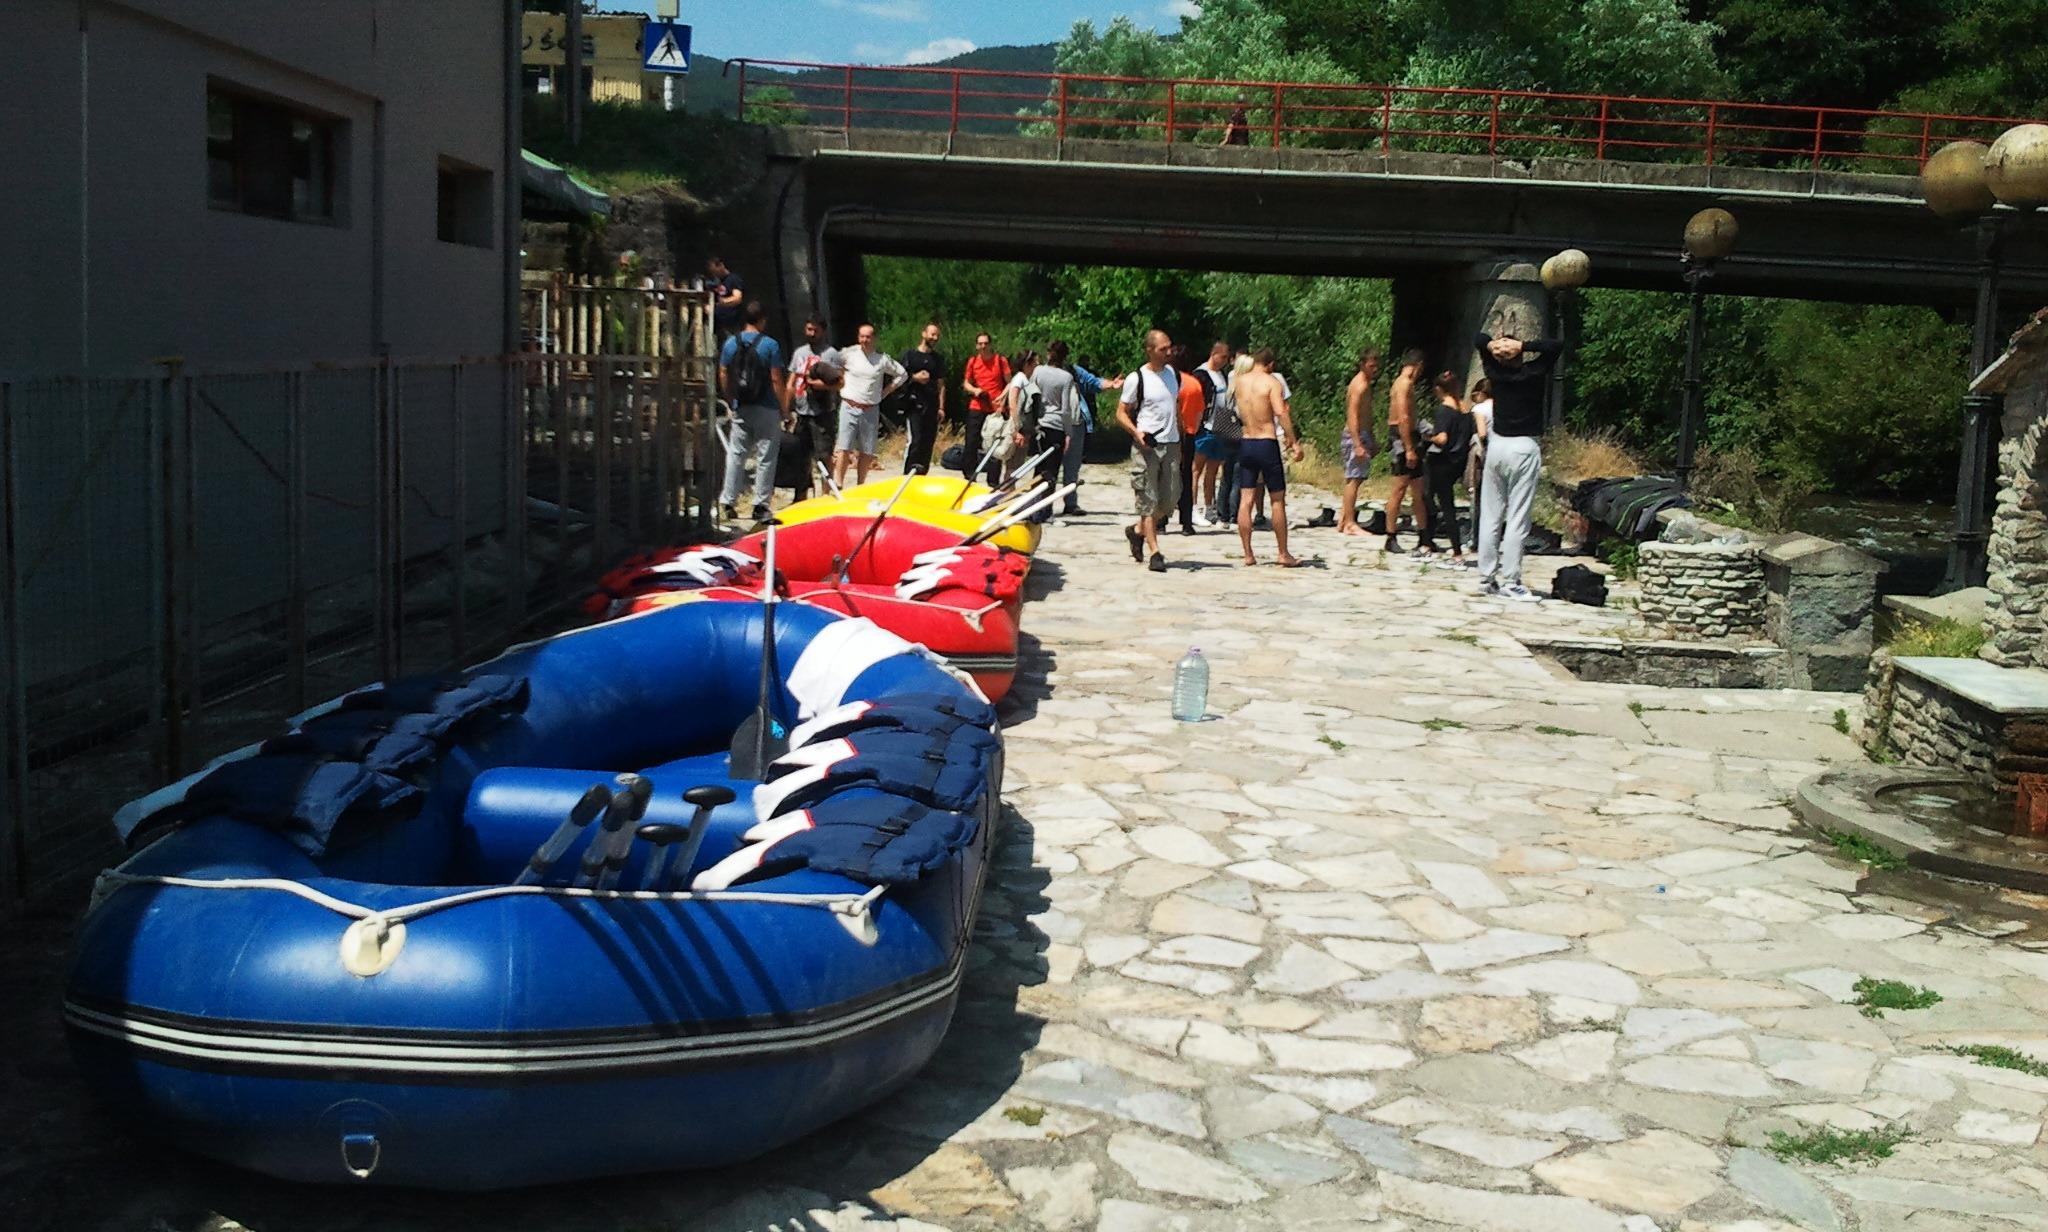 Letnja avantura na Kopaoniku